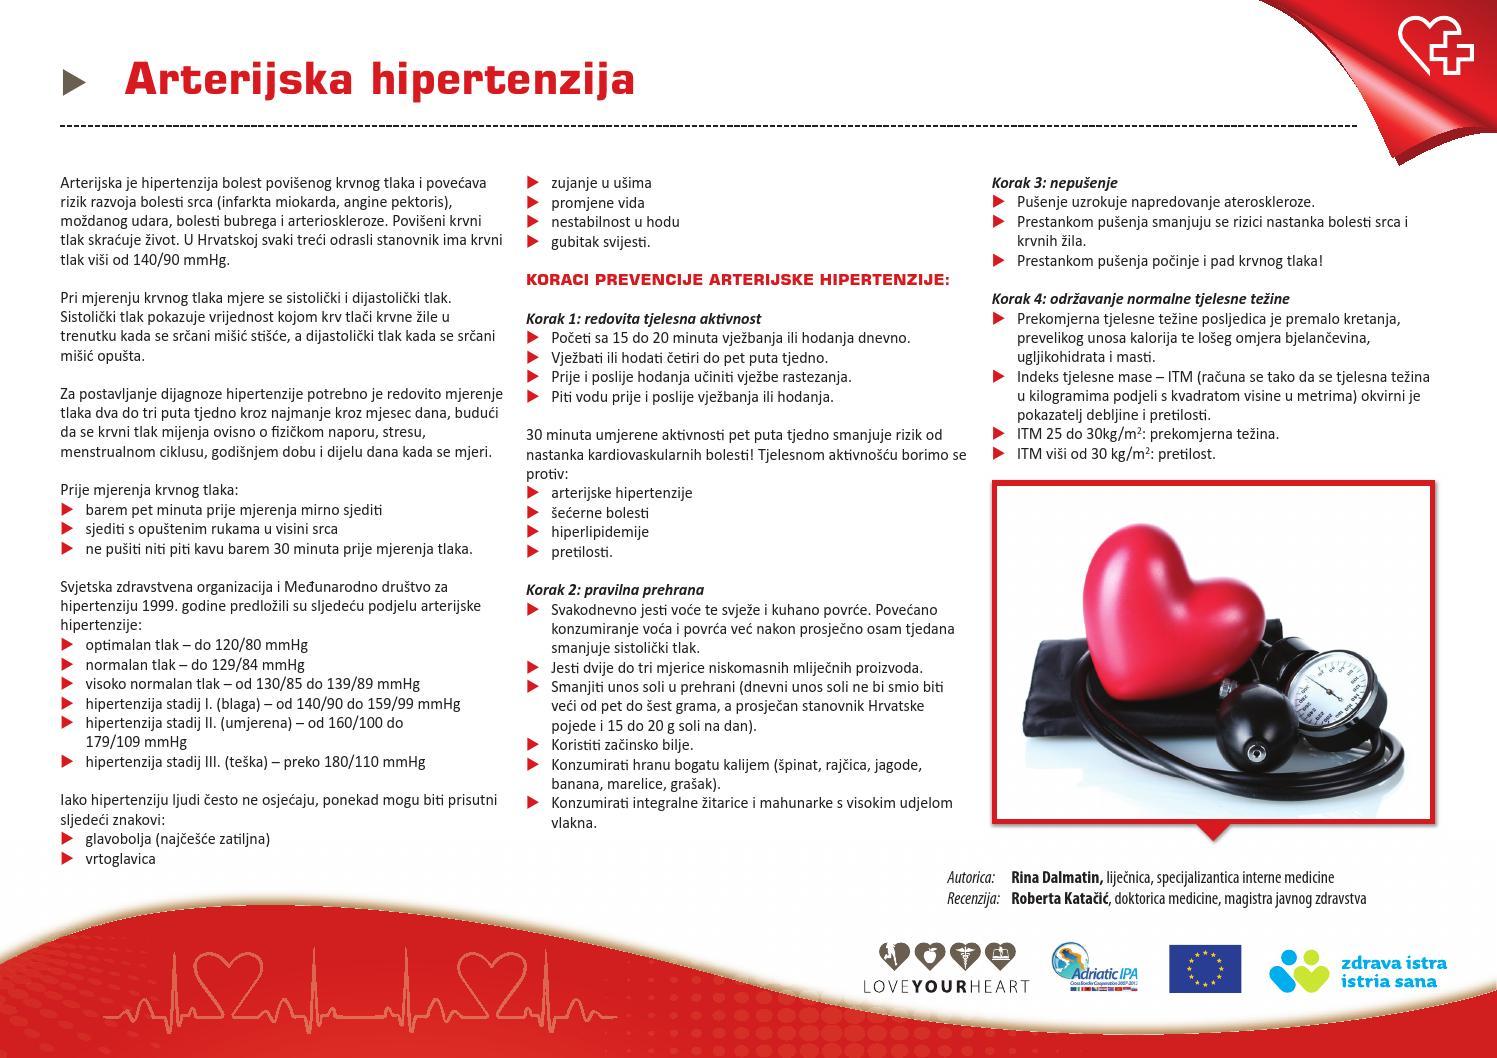 hipertenzija hipertenzija korak